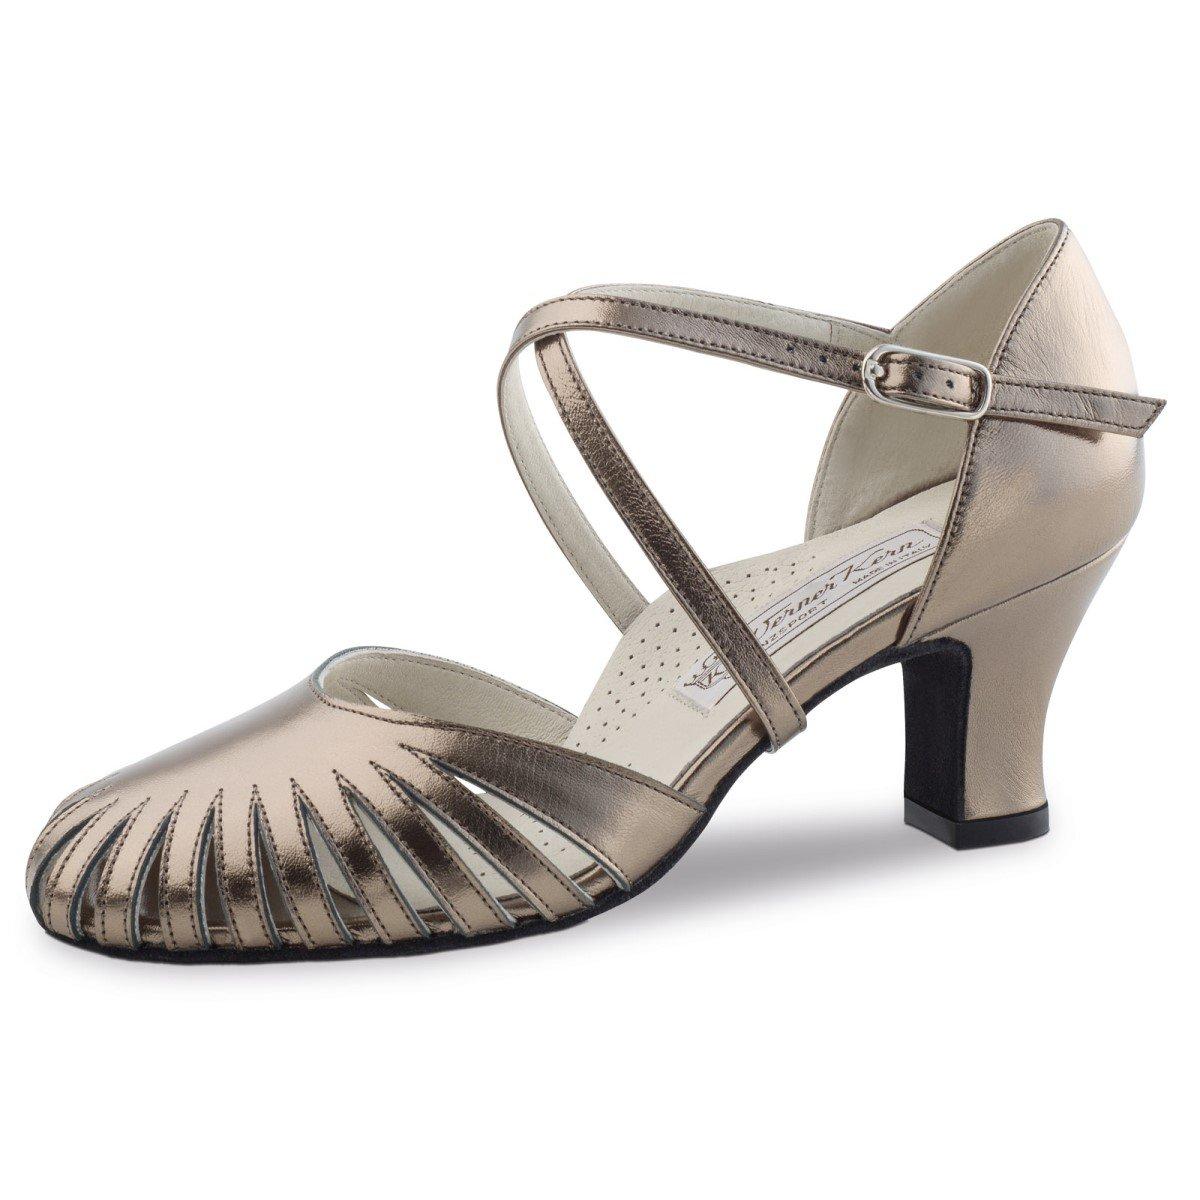 Werner Kern Femmes Chaussures de Danse Murielle - Cuir Antique - 6 cm Murielle 6